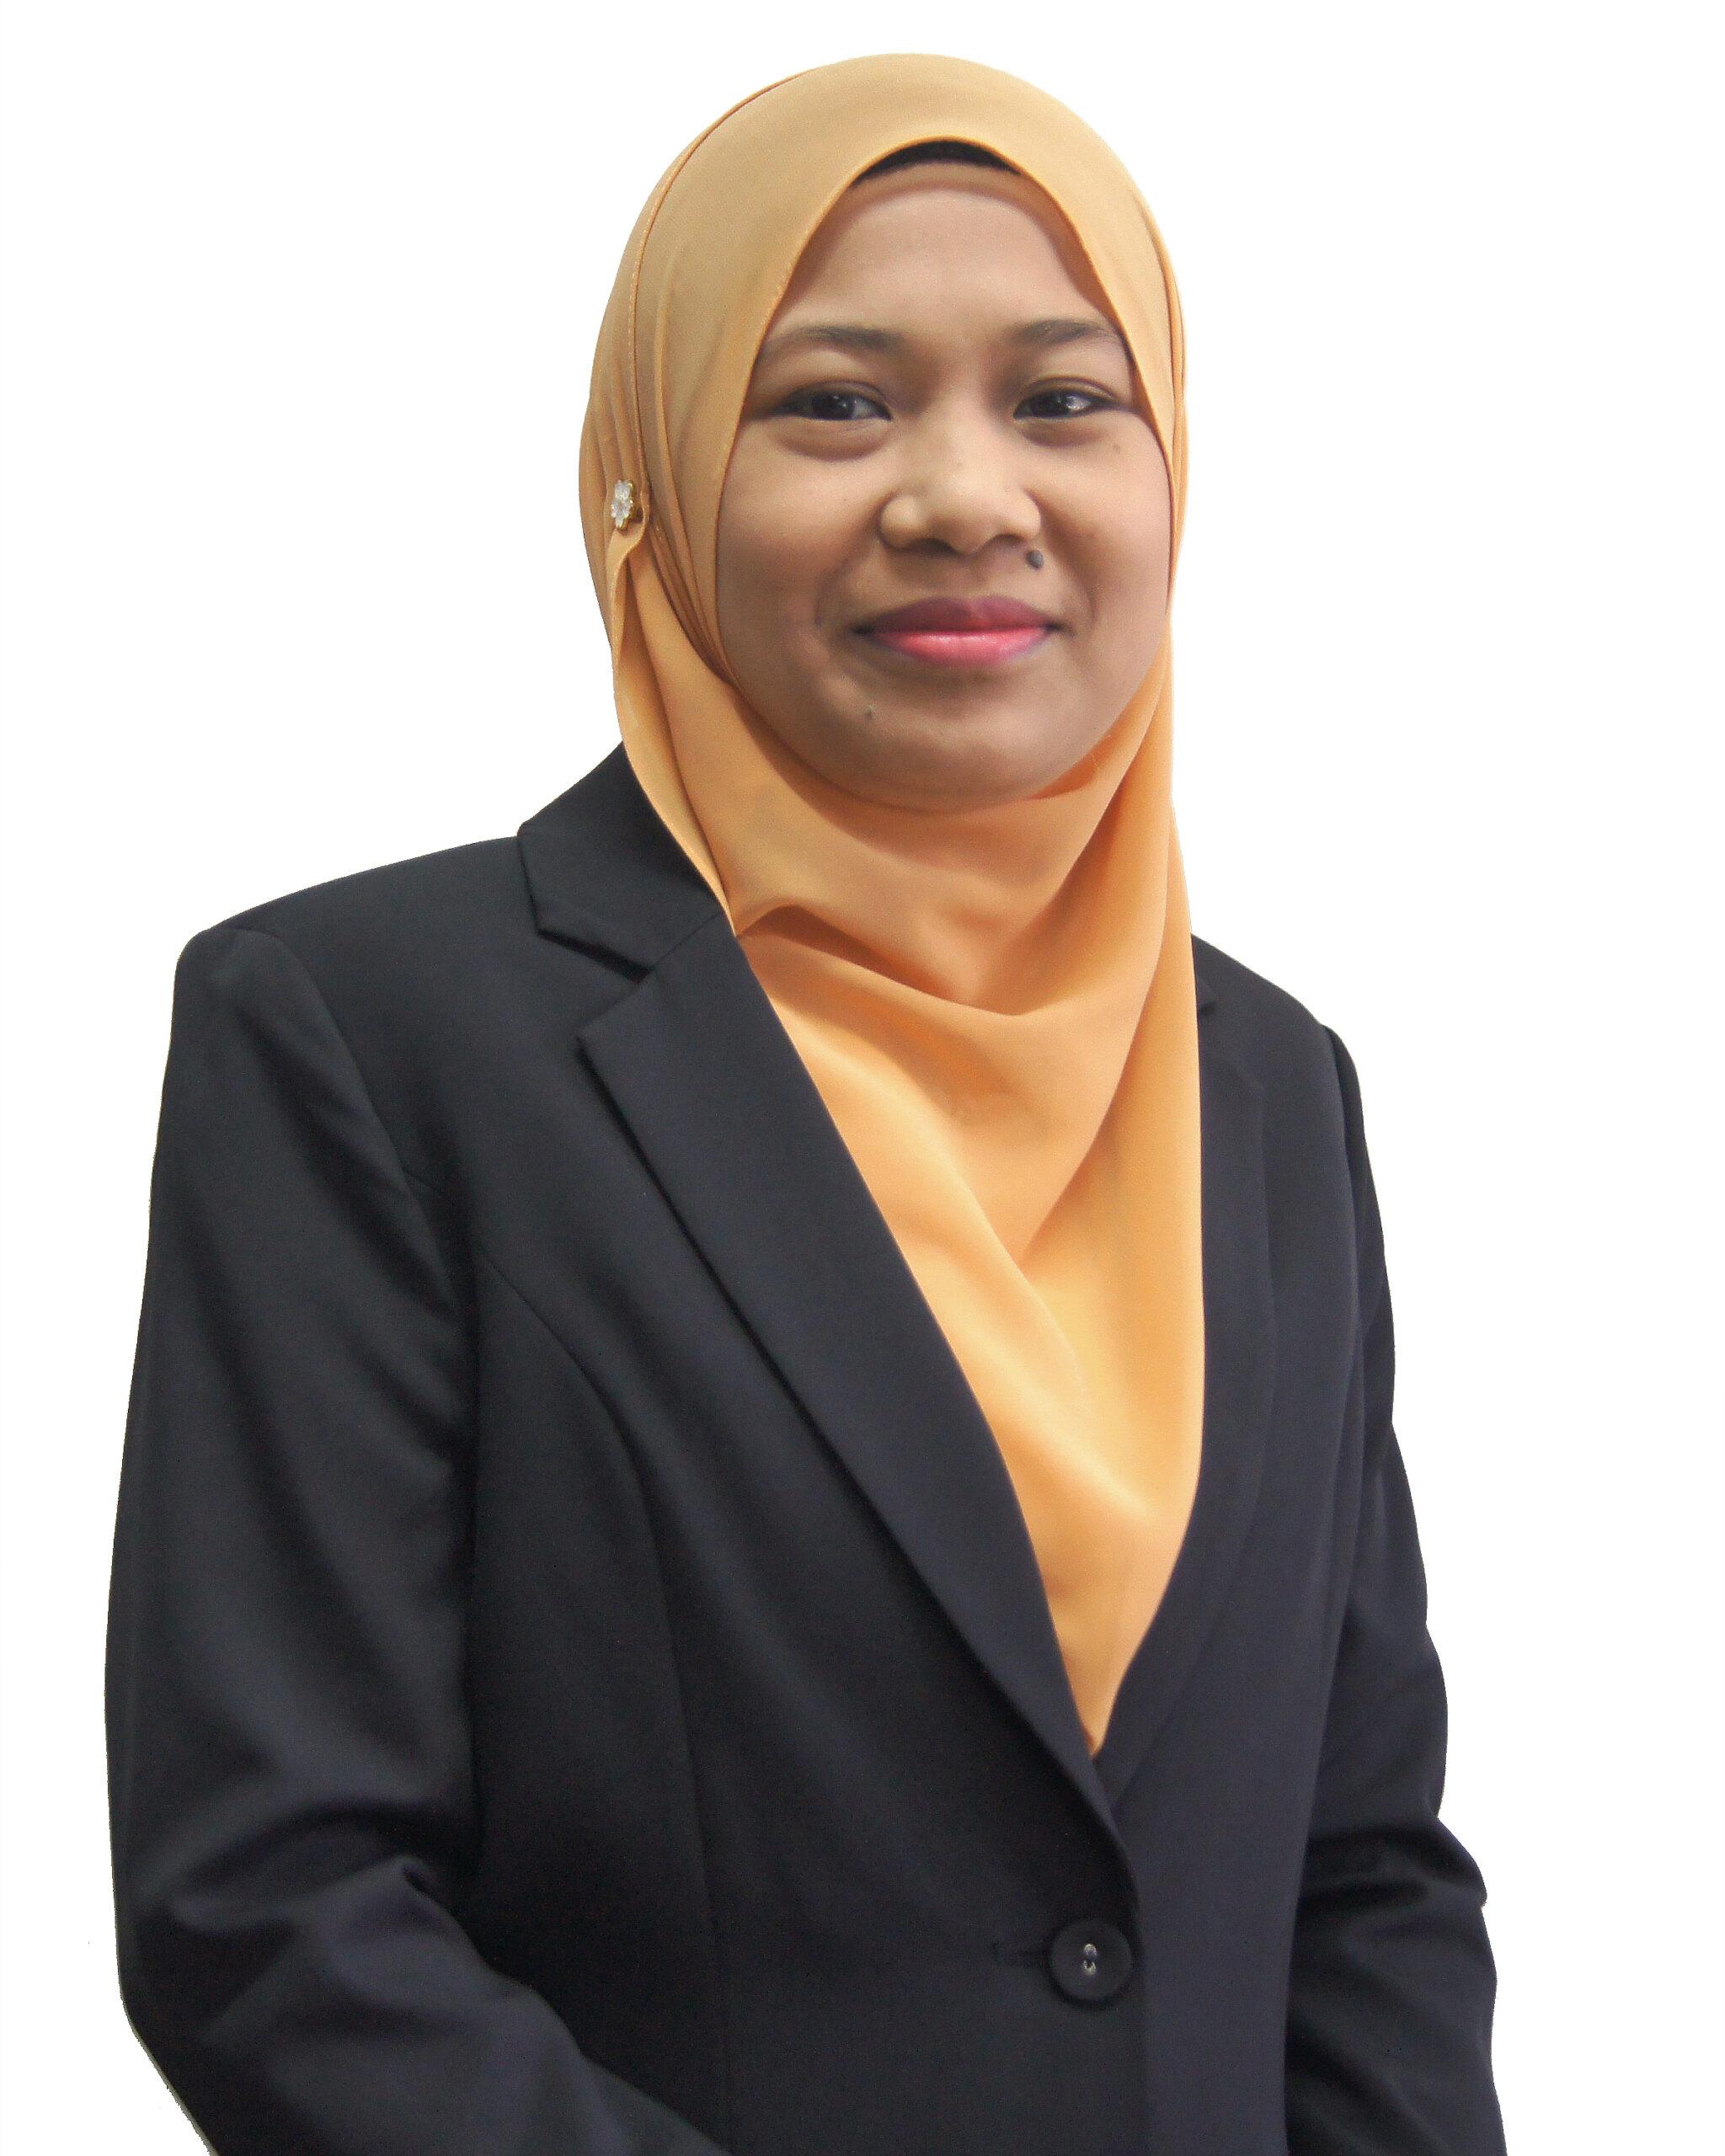 Yusnorsyazana Binti Mohd Yunos